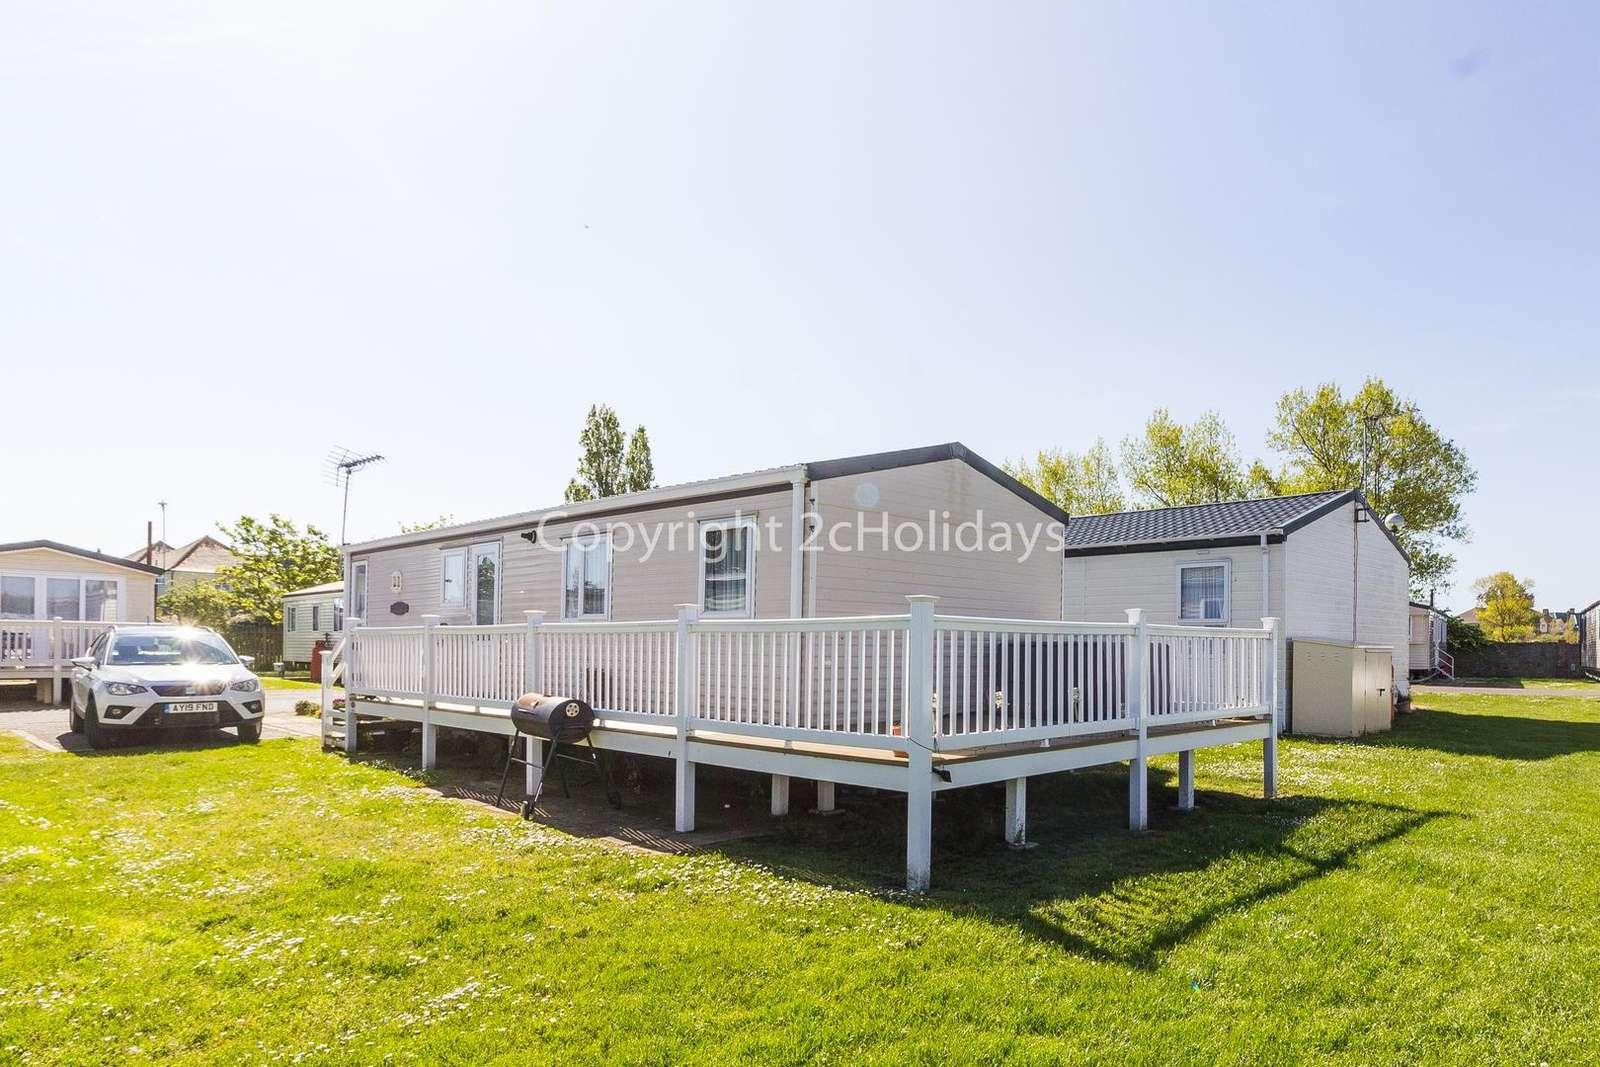 Luxury caravan in a great location near to Clacton Pier